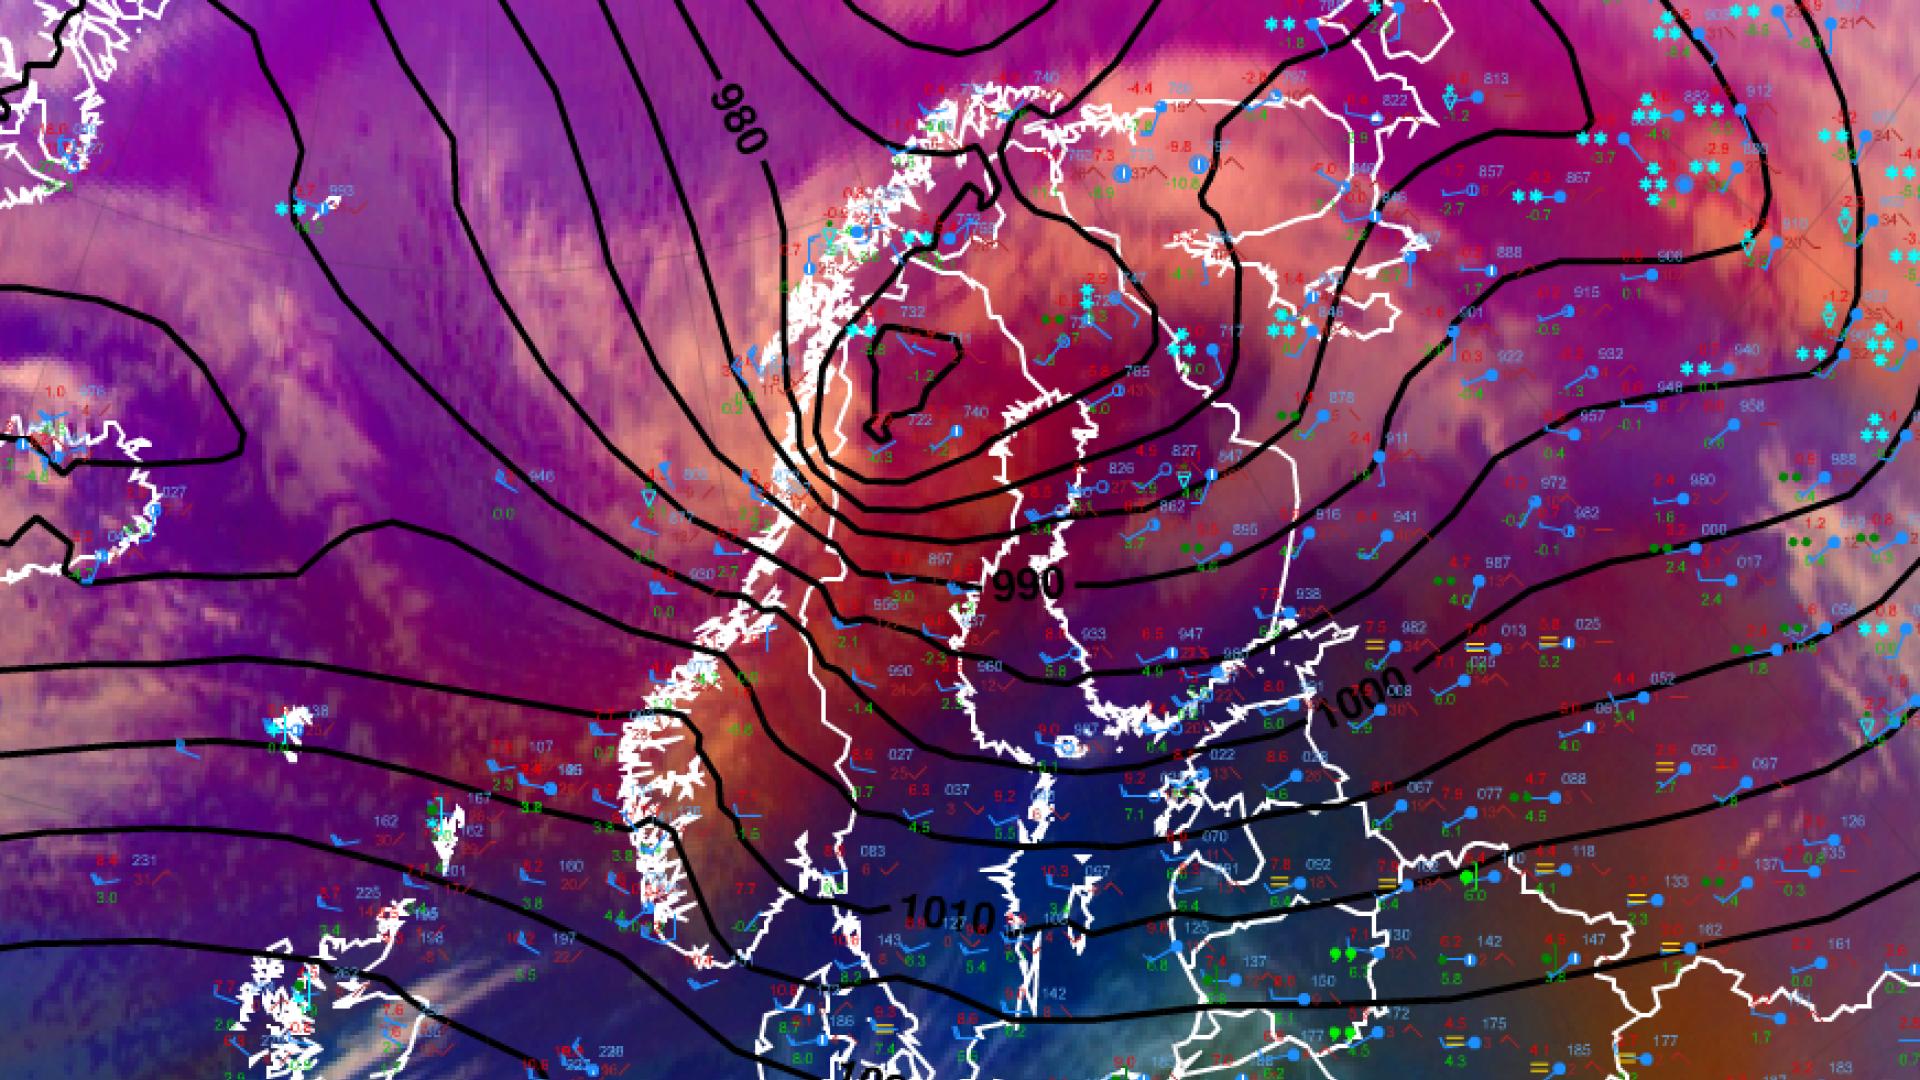 Storms over Scandinavia